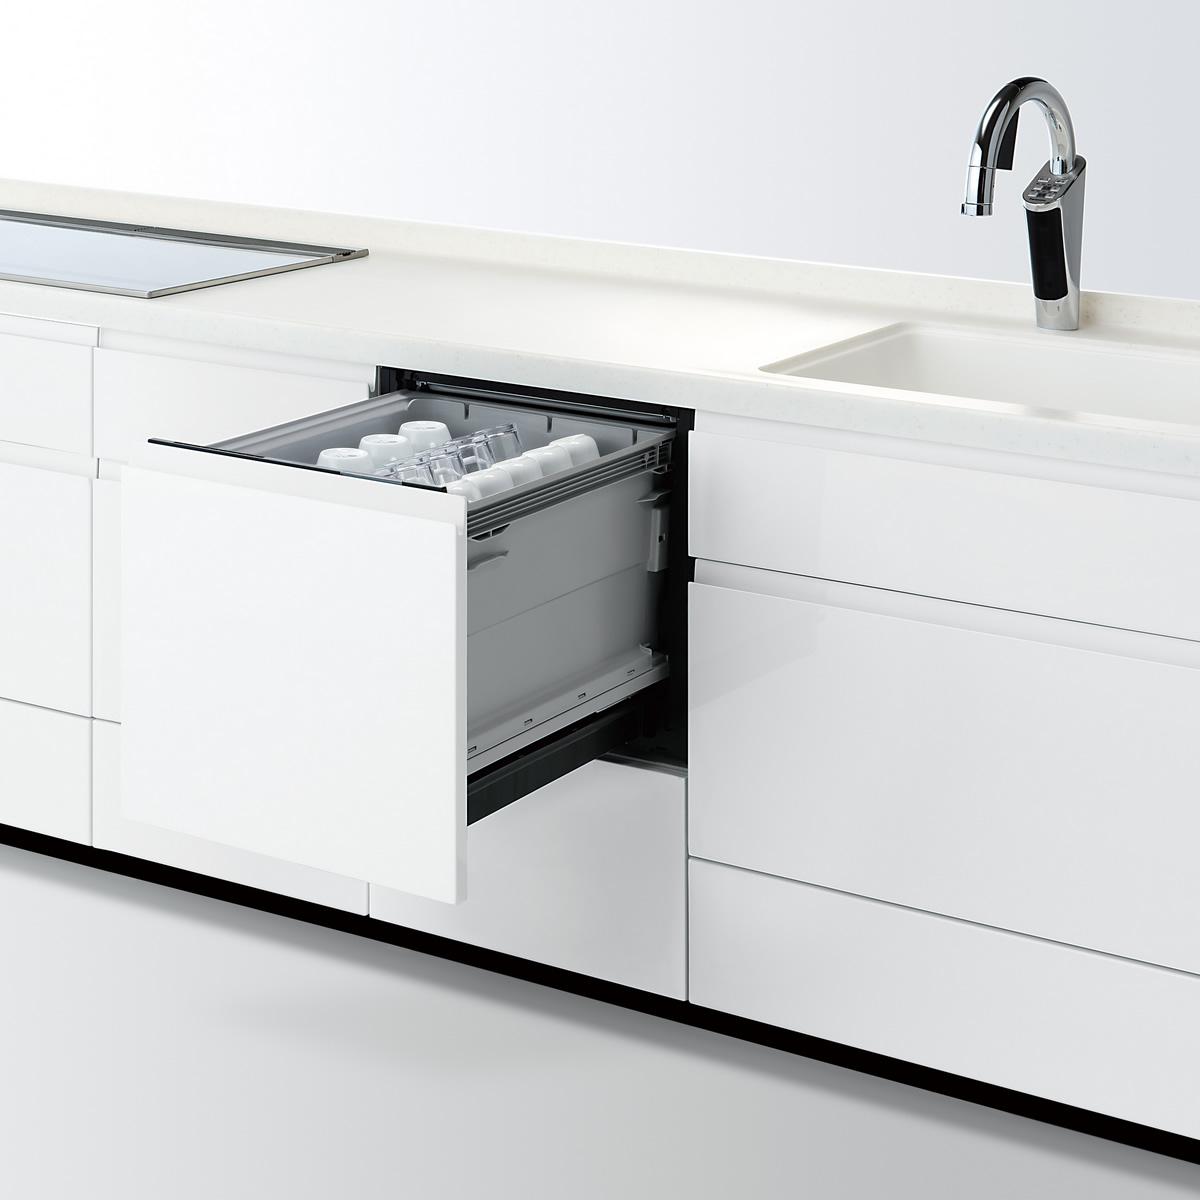 【NP-45KS8W】 パナソニック ビルトイン食器洗い乾燥機(食洗機) K8シリーズ 幅45cm ミドルタイプ ドアフル面材型